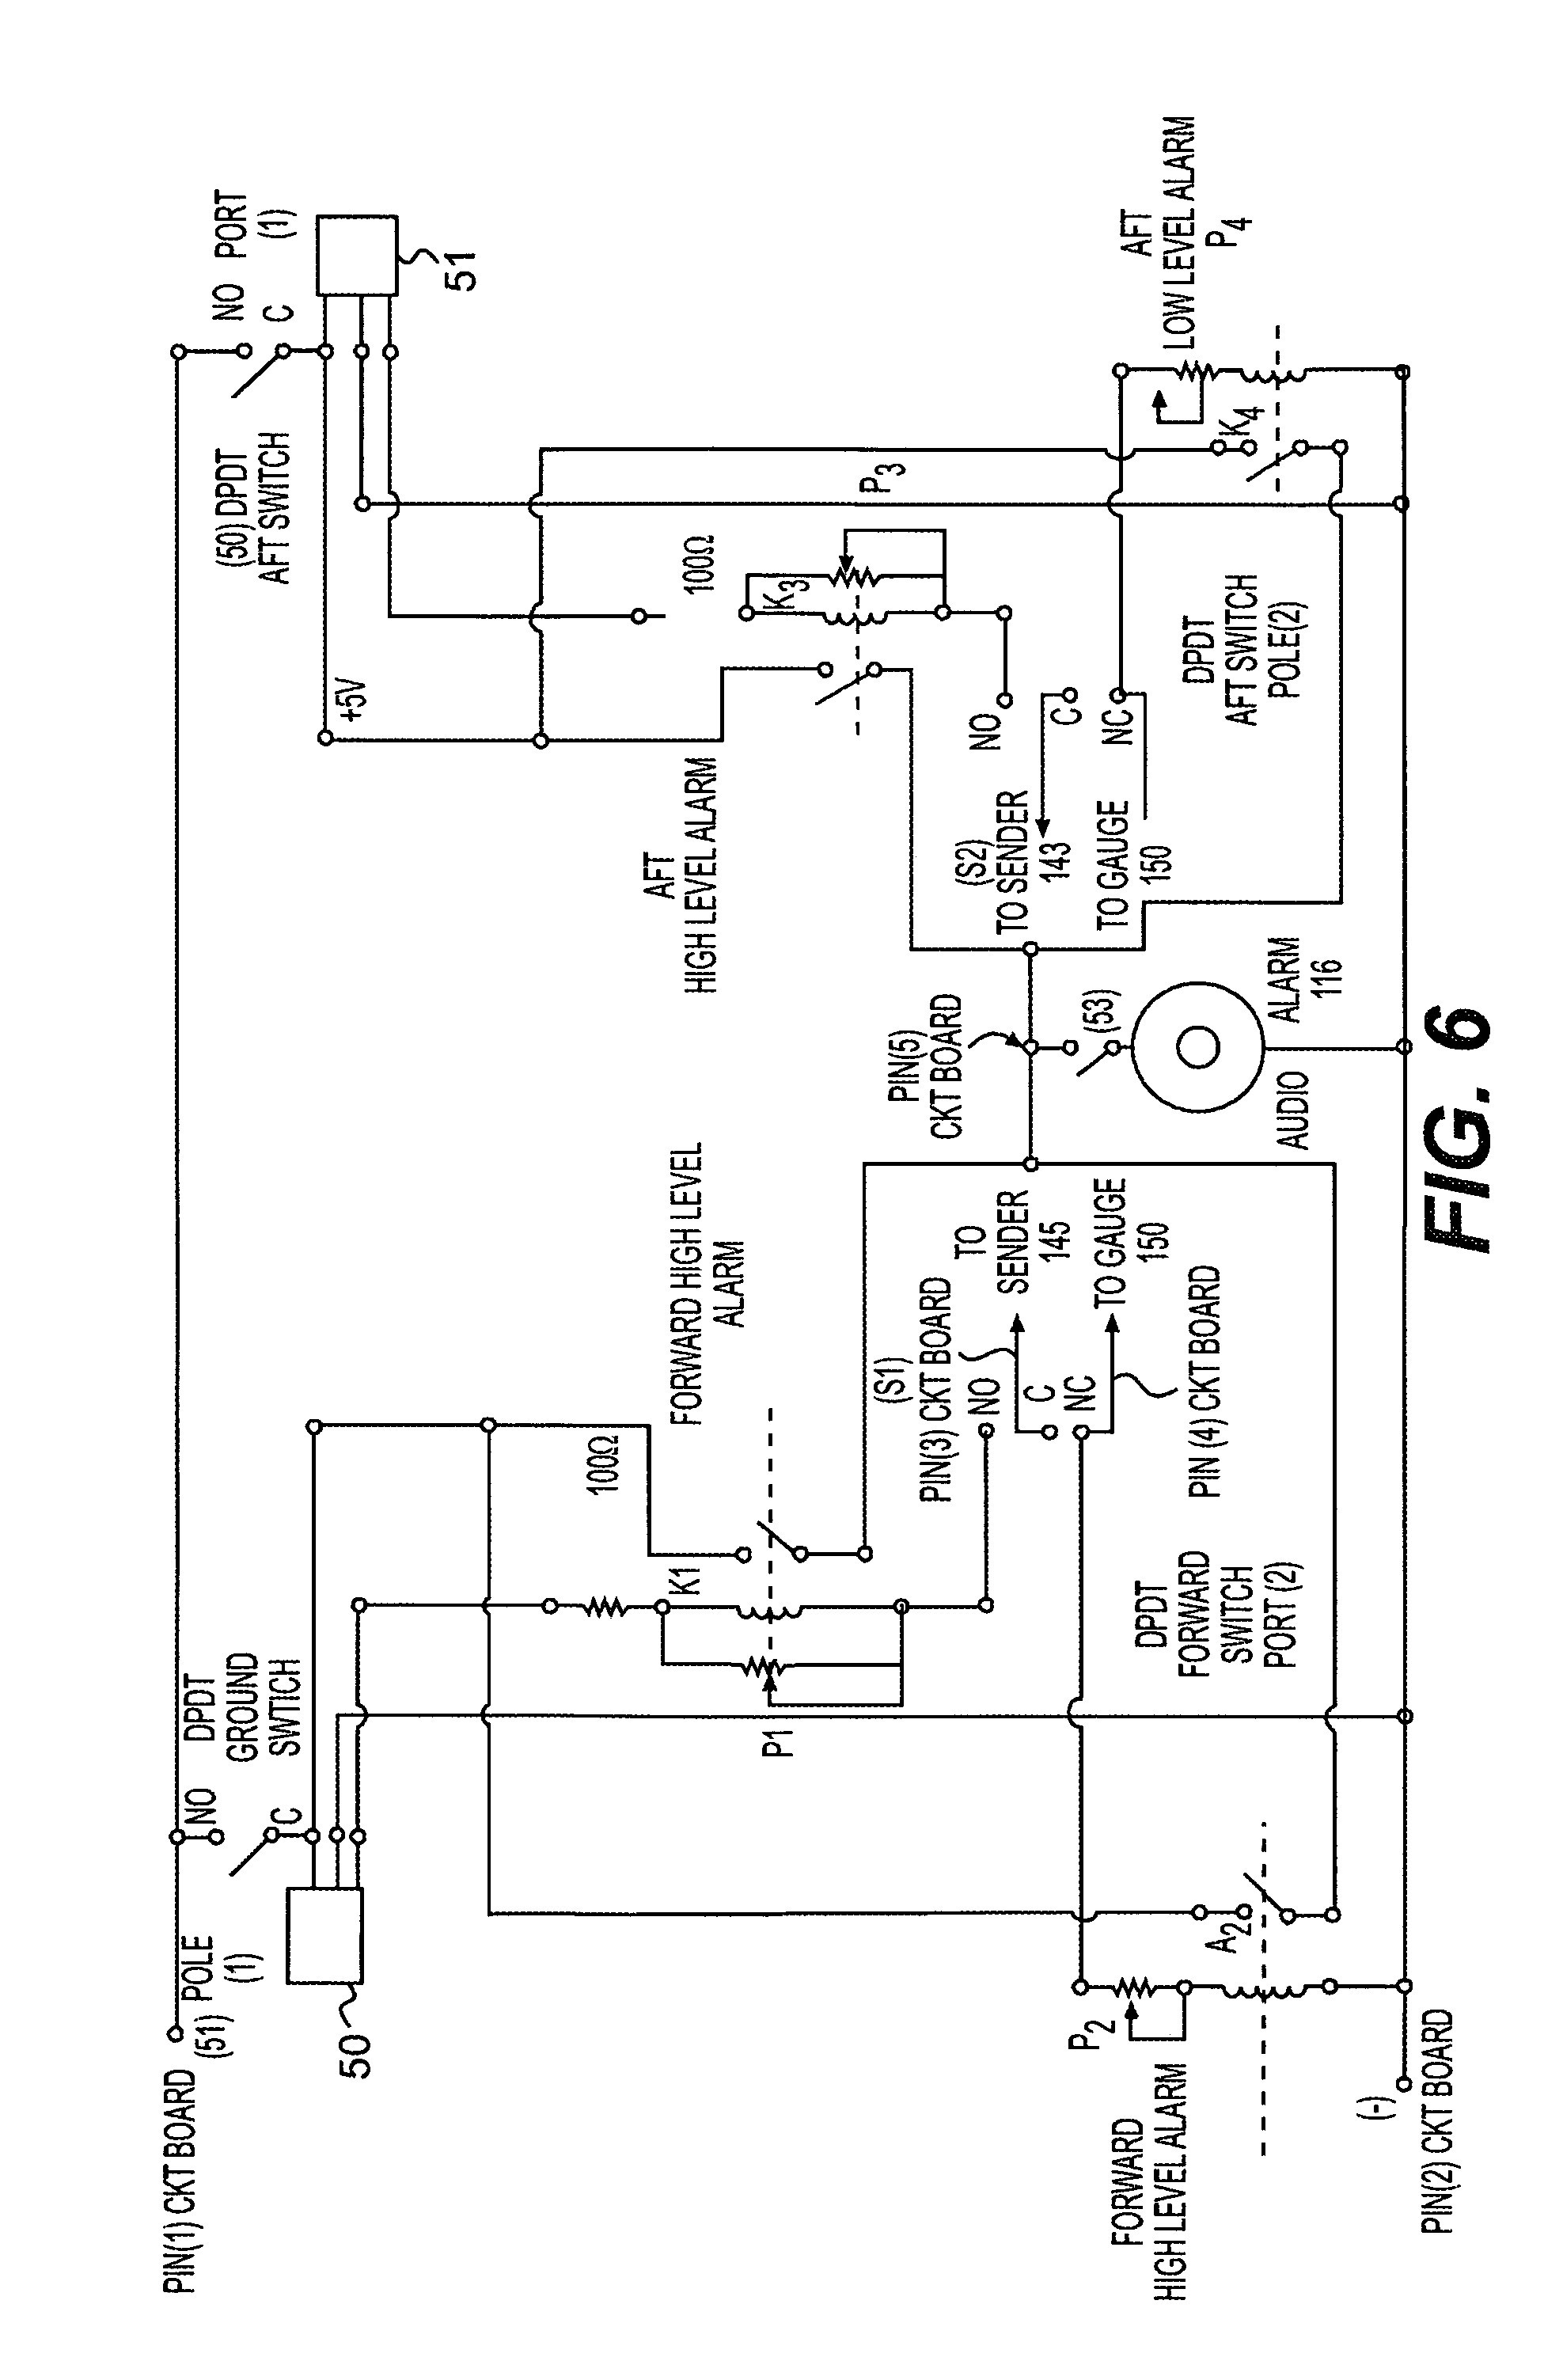 Wiring Diagram For Autopage Alarm Valid Unique Autopage Wiring Diagram Position Electrical Diagram